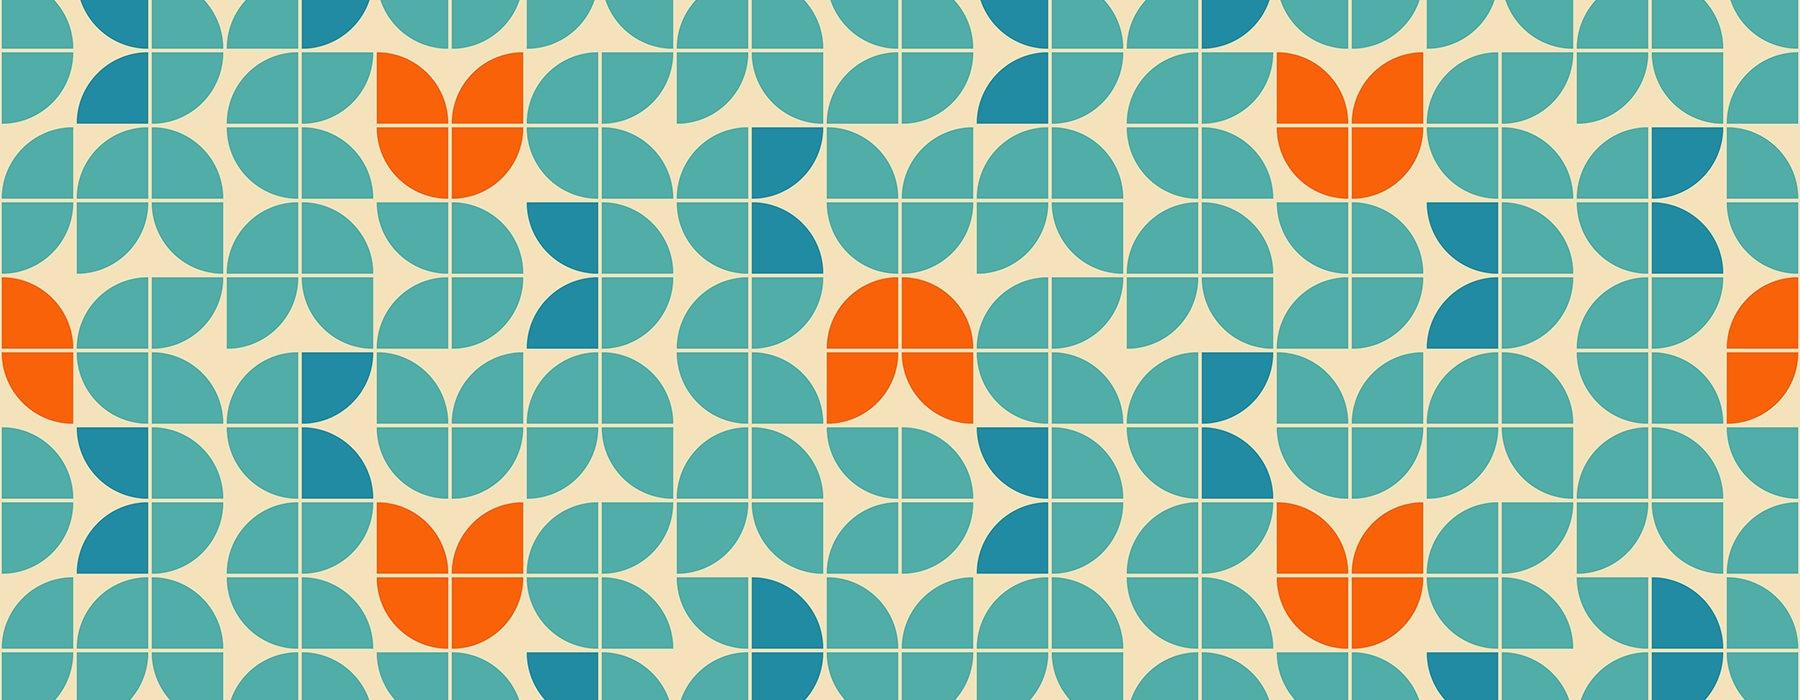 Artsy Pattern